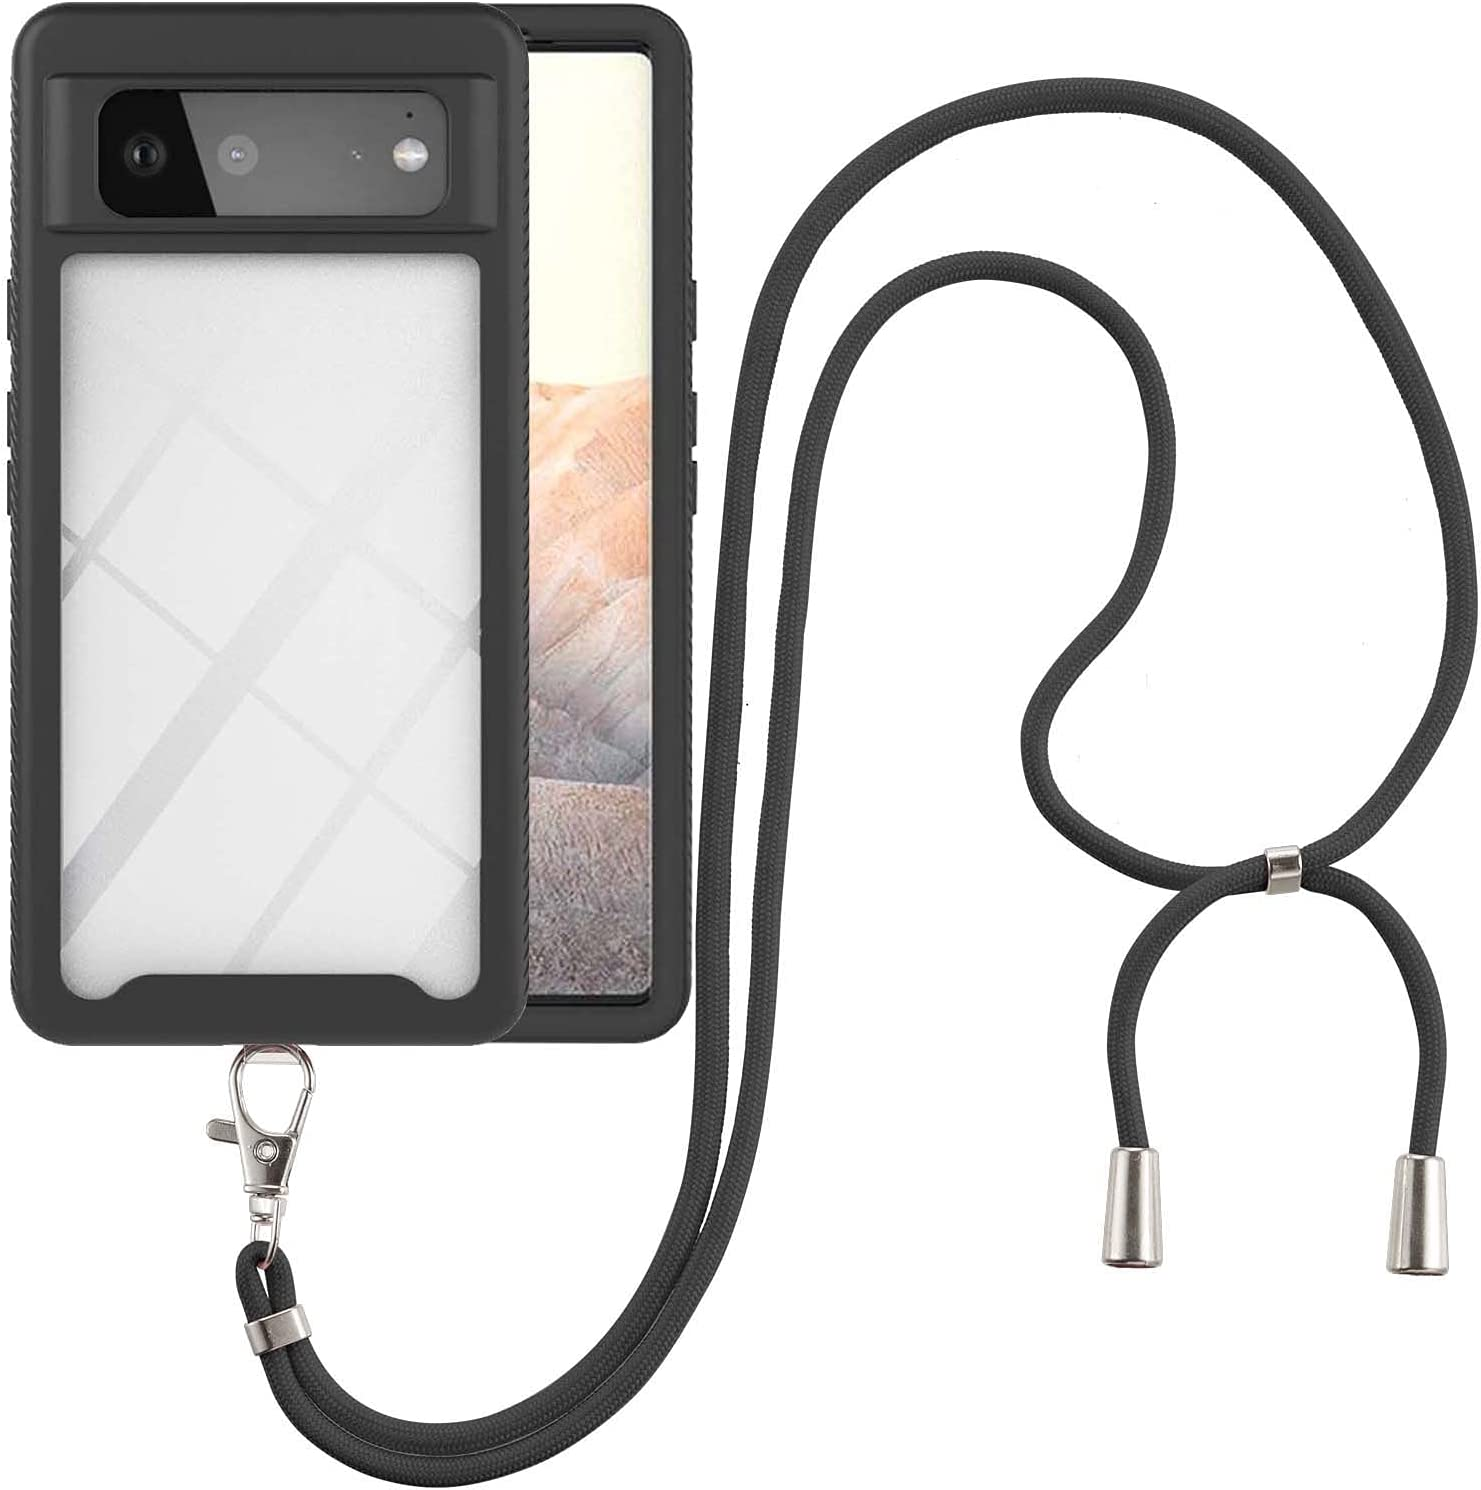 Google Pixel 6 Case, EabHulie Transparent Back No-Slip Bumper with Adjustable Crossbody Lanyard Strap Case, Shockproof Full Body Protection Cover for Google Pixel 6 Black